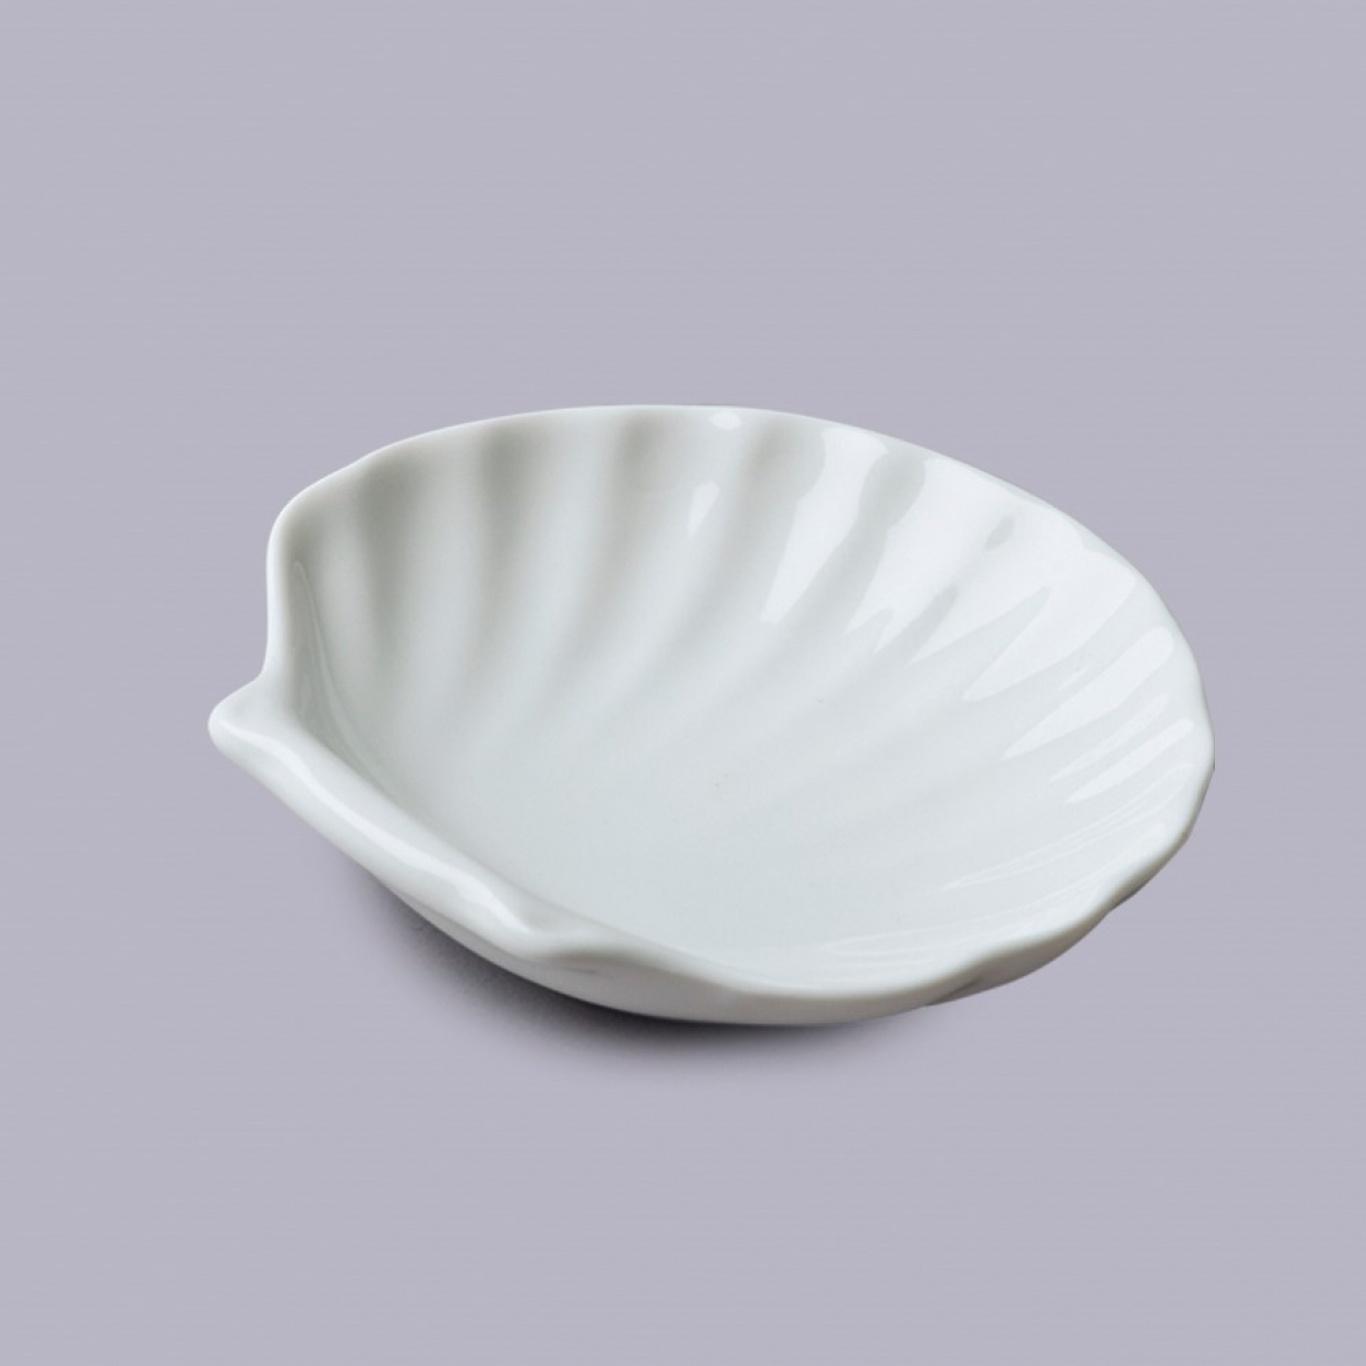 Image of Shell Dish Mini